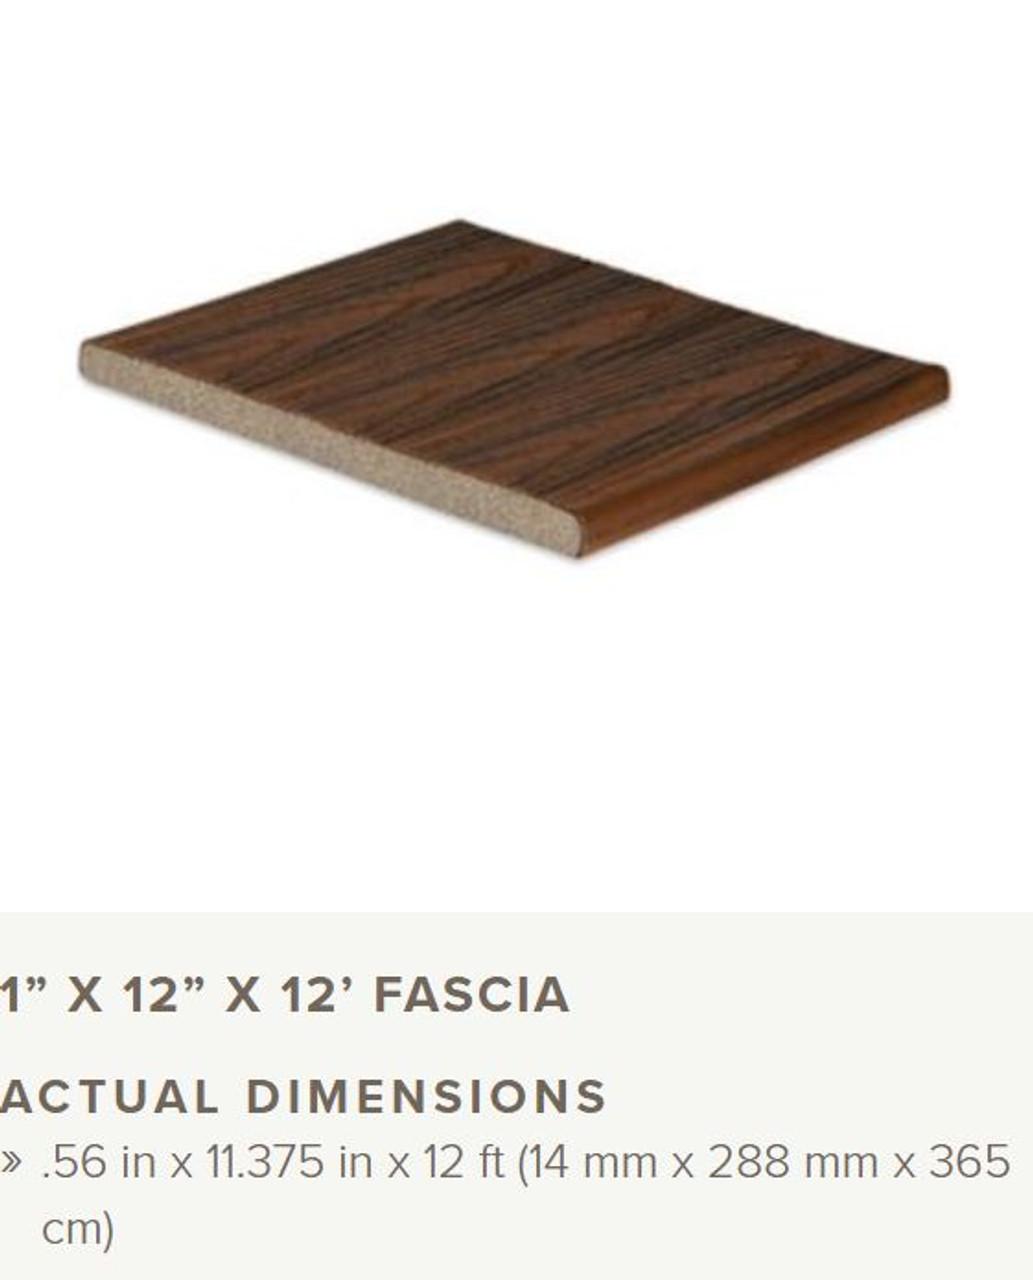 Trex Transcend Tropical Fascia 1x12x12 Profile